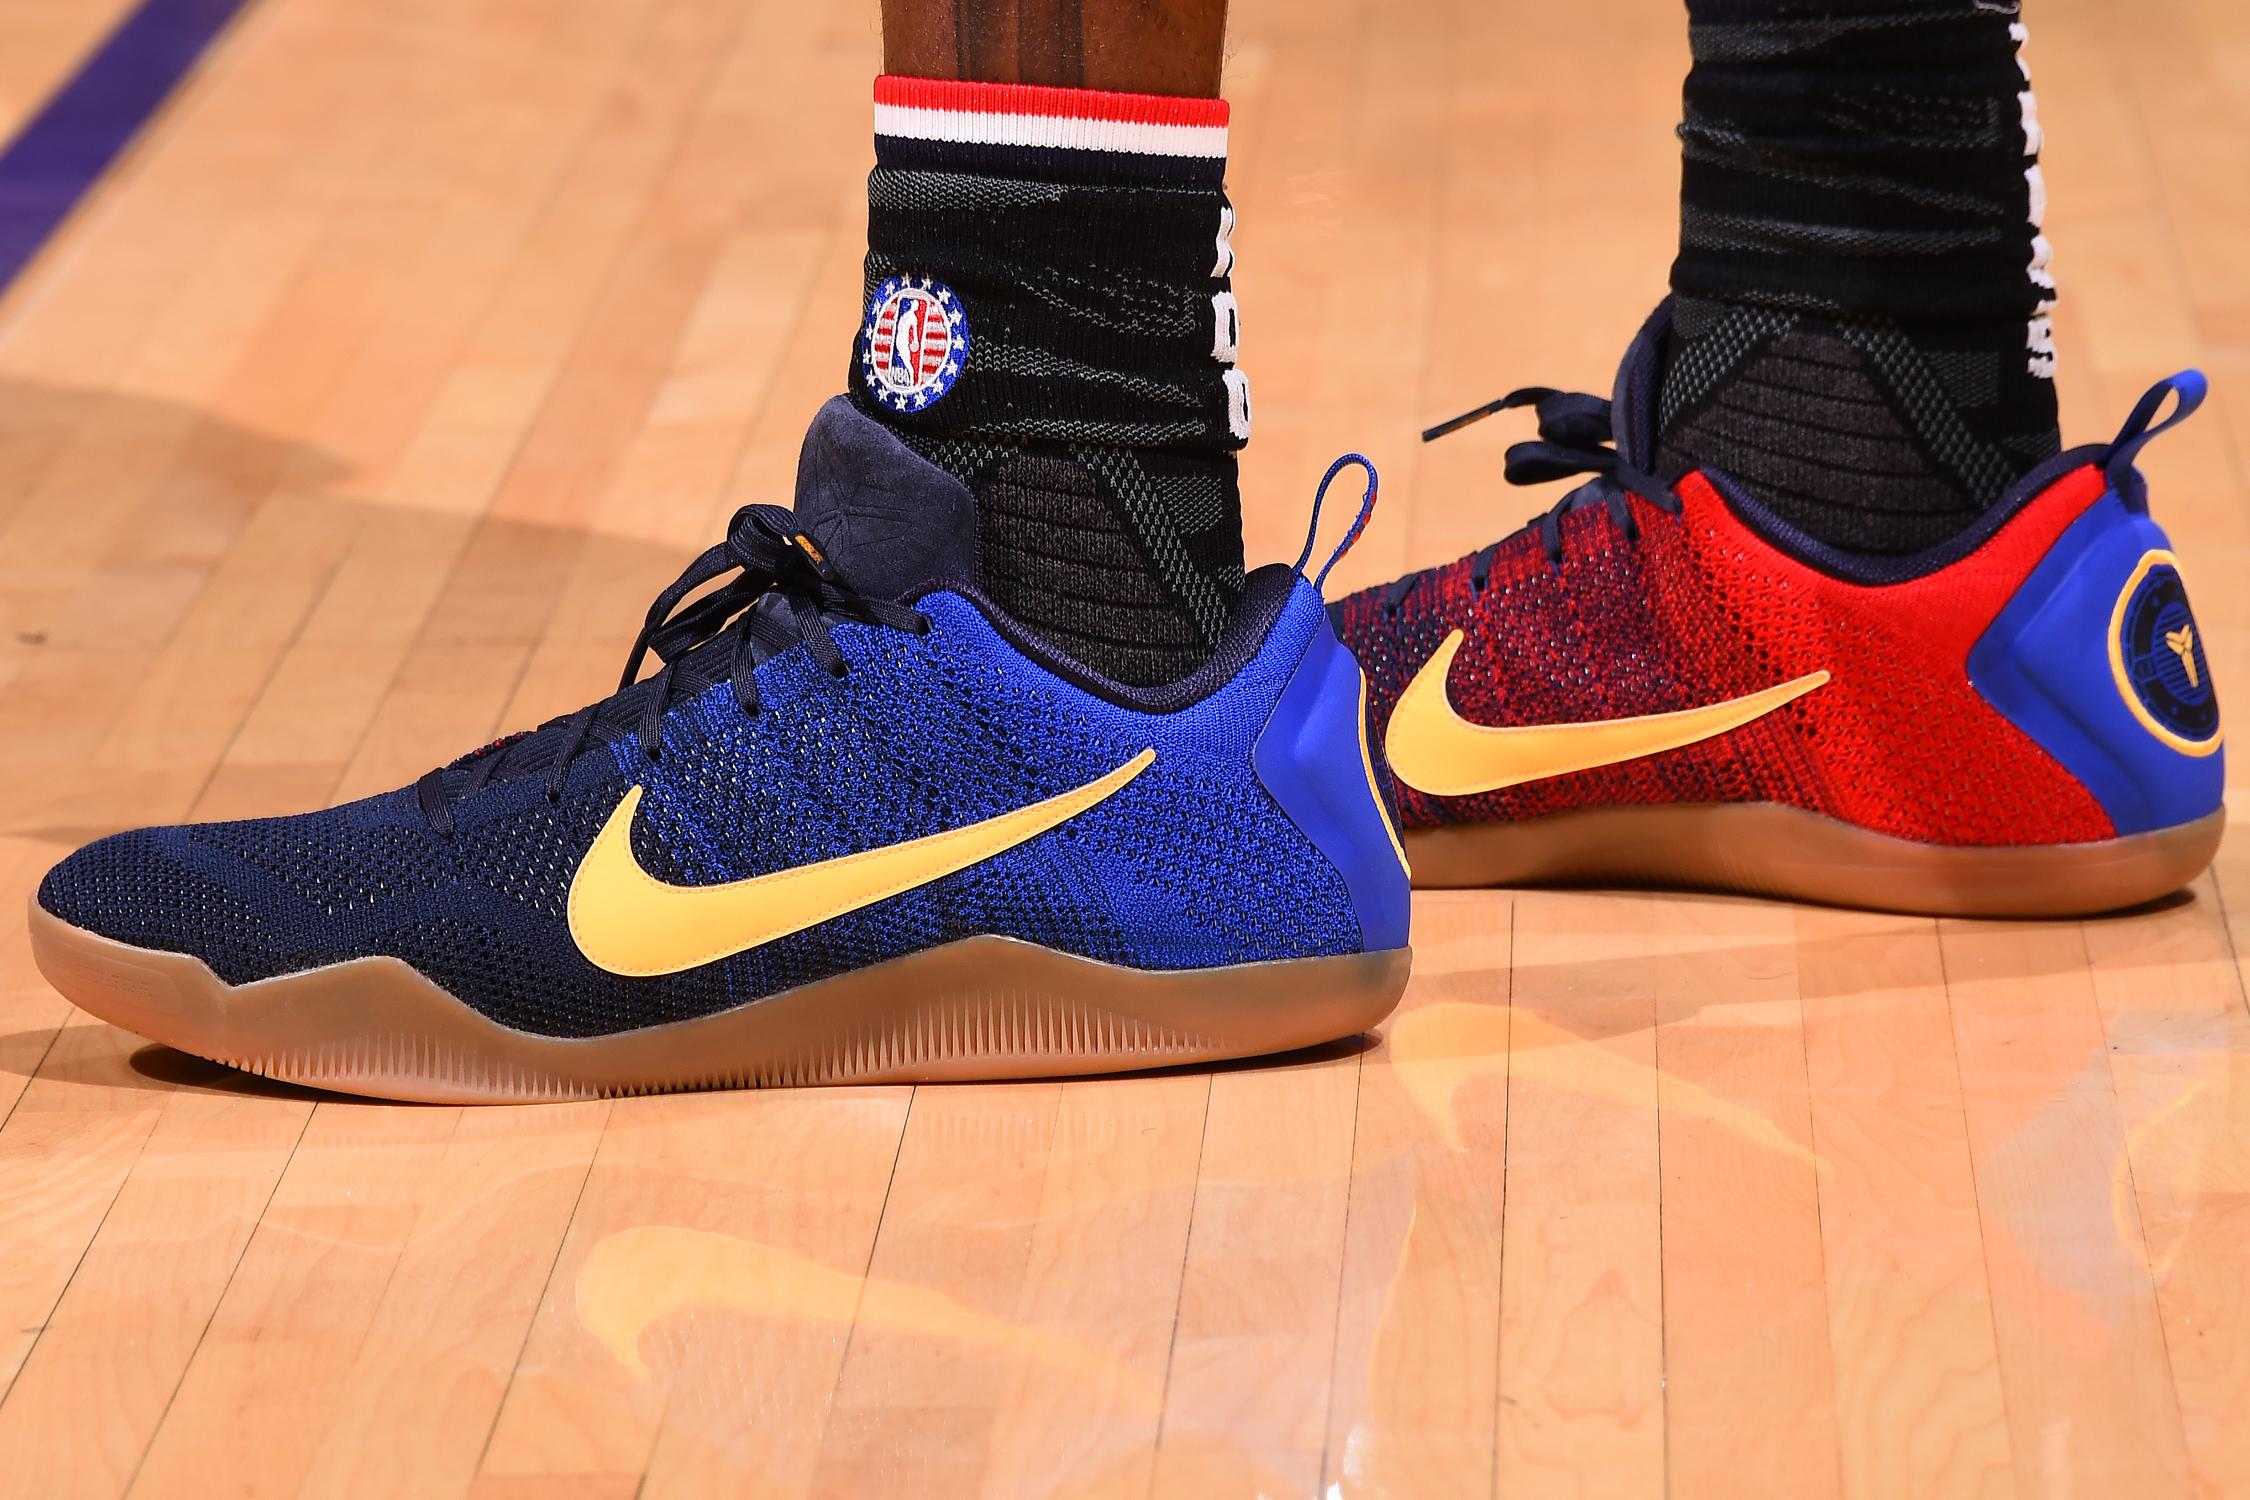 Nike Kobe XI Elite worn by Andre Iguodala